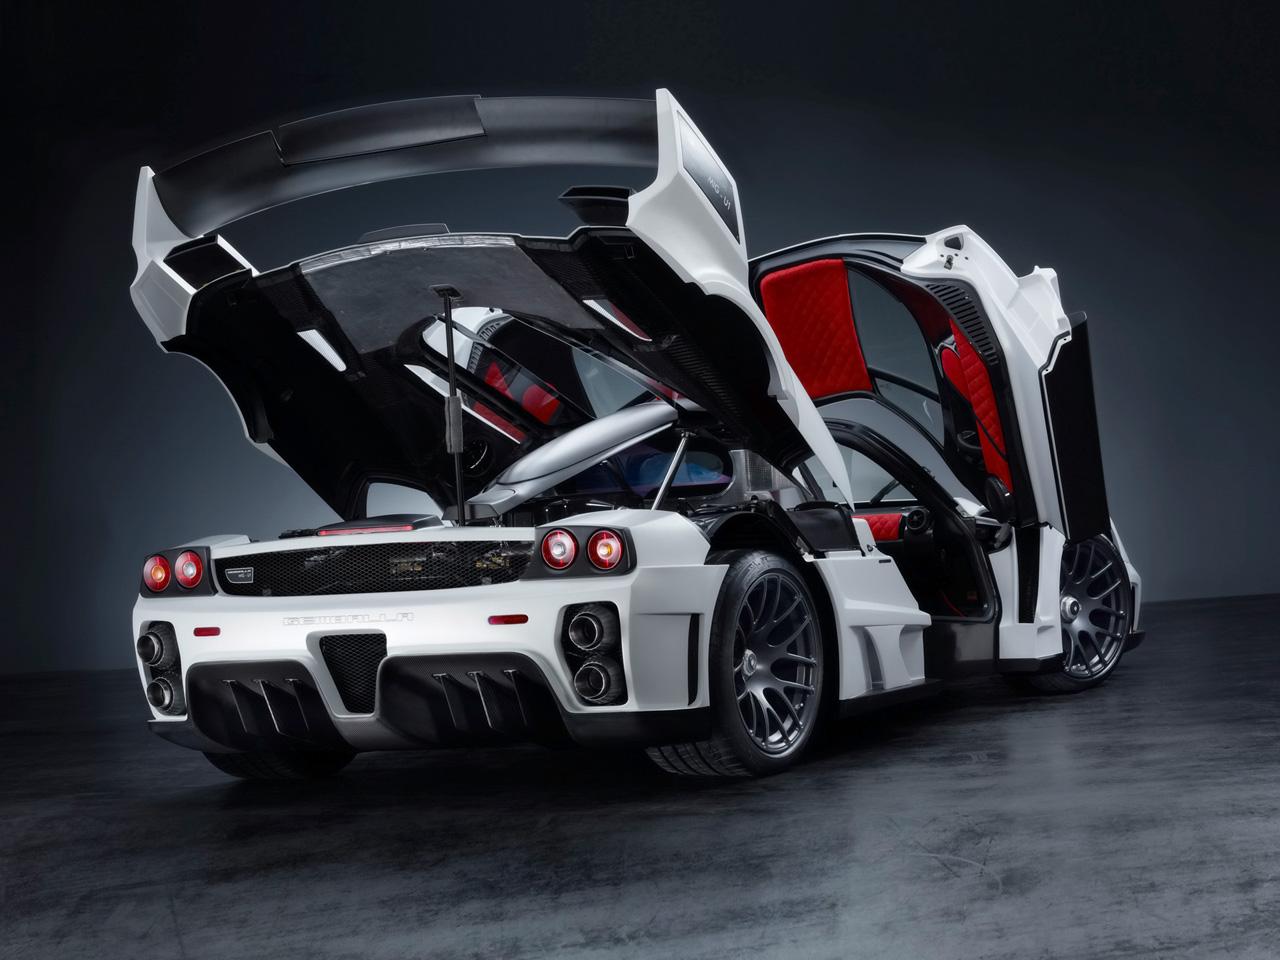 2010 Gemballa Mig Ui Ferrari Enzo 3